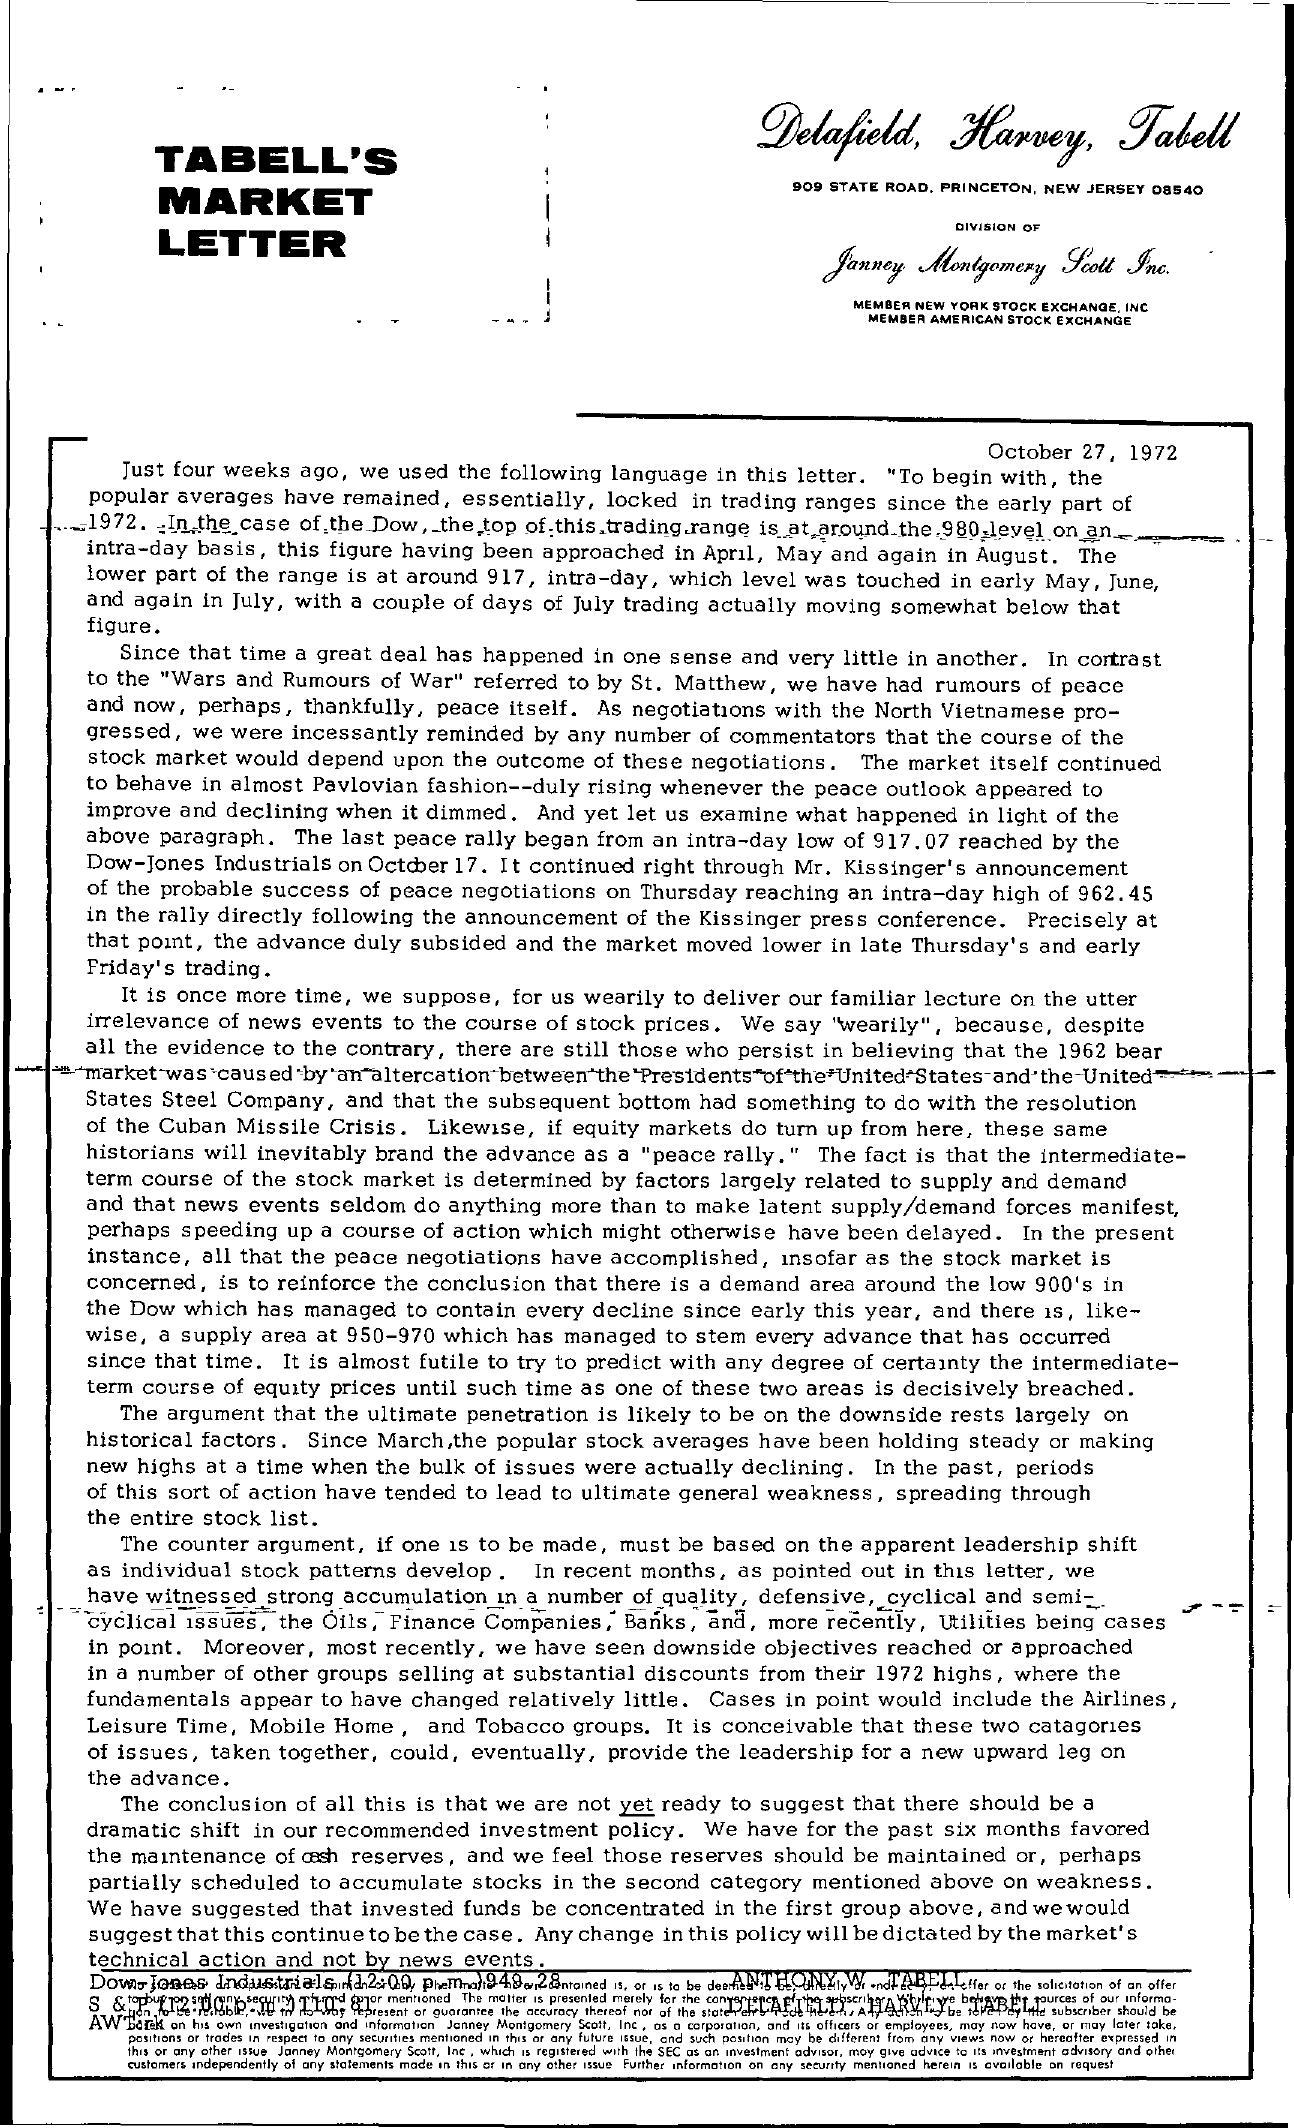 Tabell's Market Letter - October 27, 1972